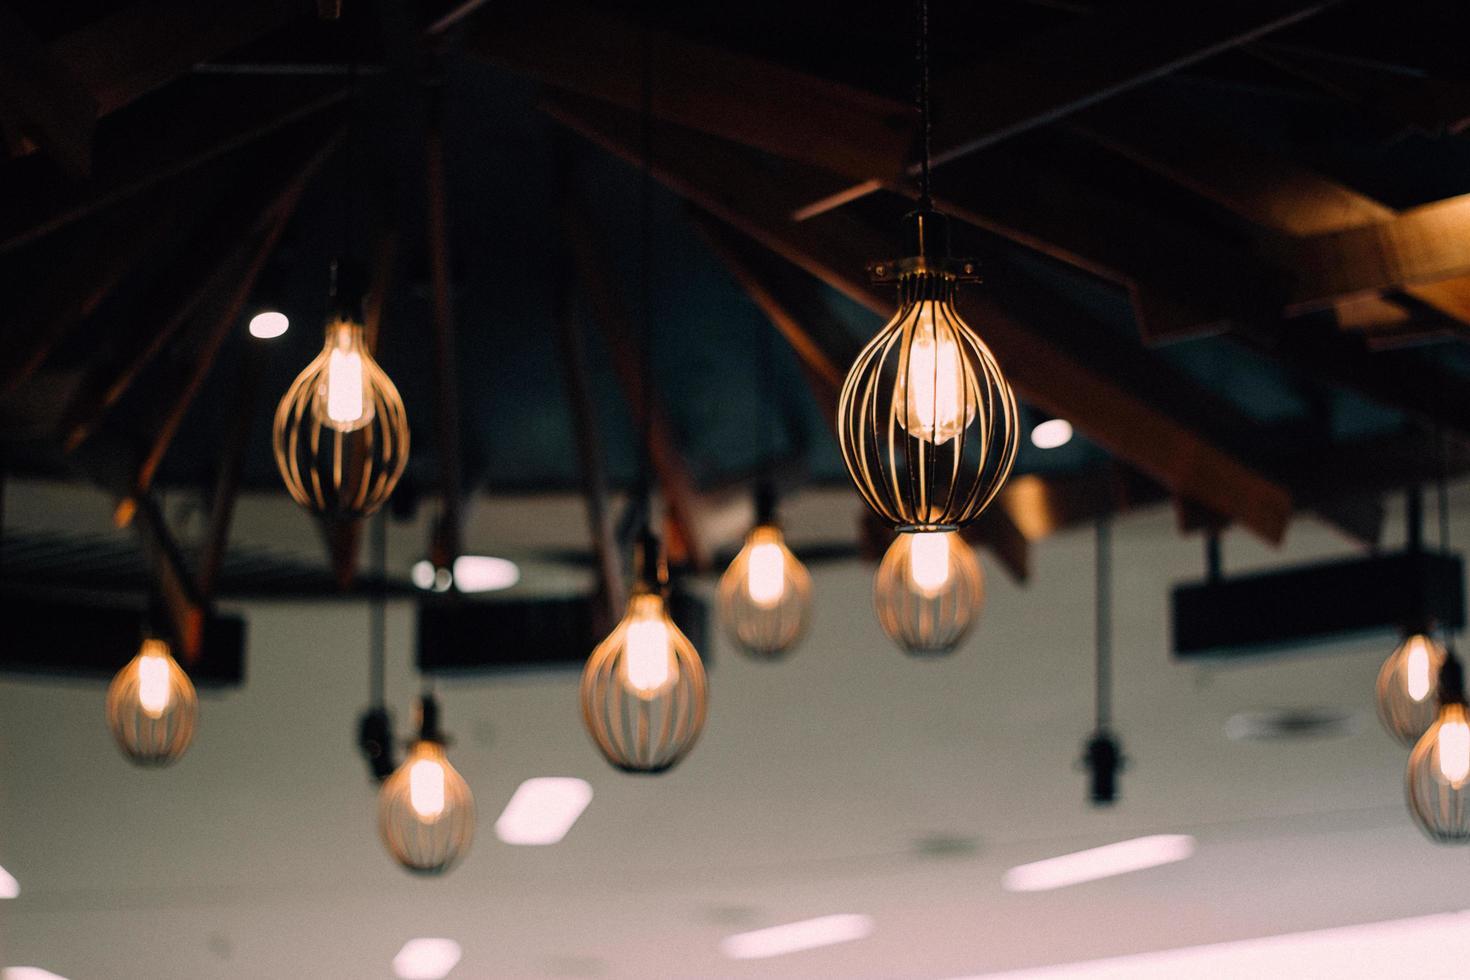 lampes suspendues lumineuses photo